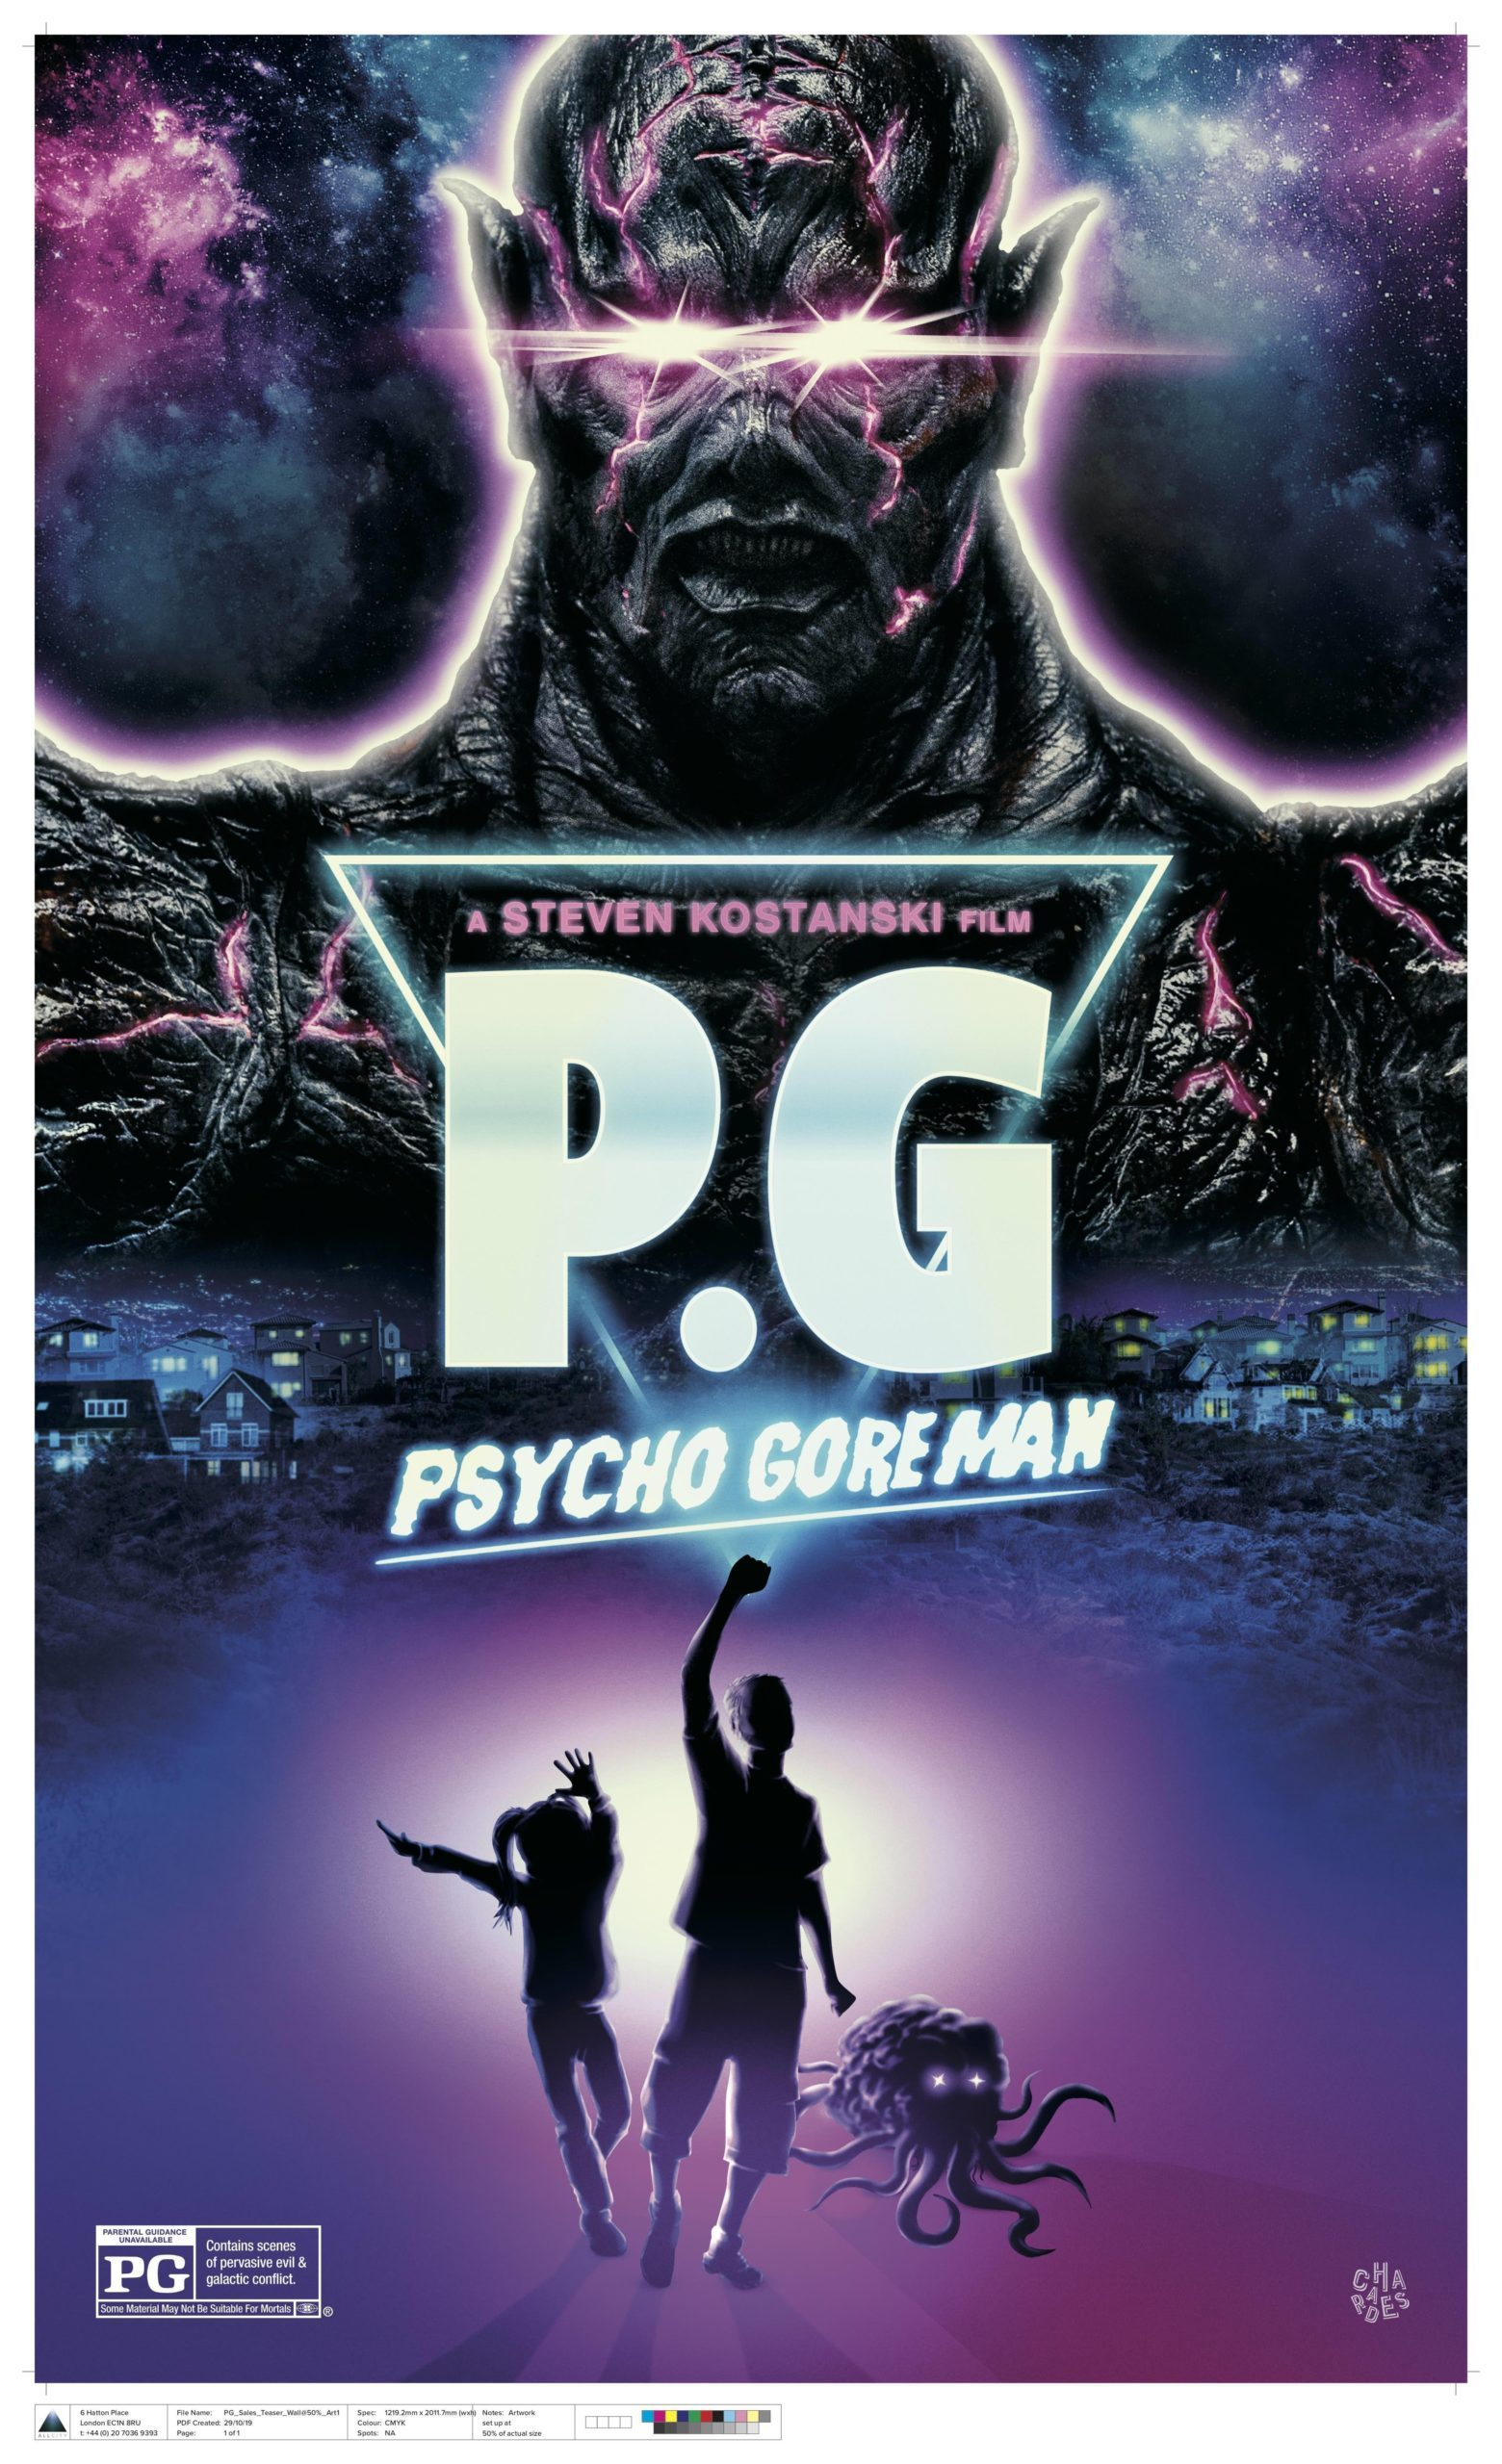 Steven-Kostanski-Psycho-Goreman-PG-scaled